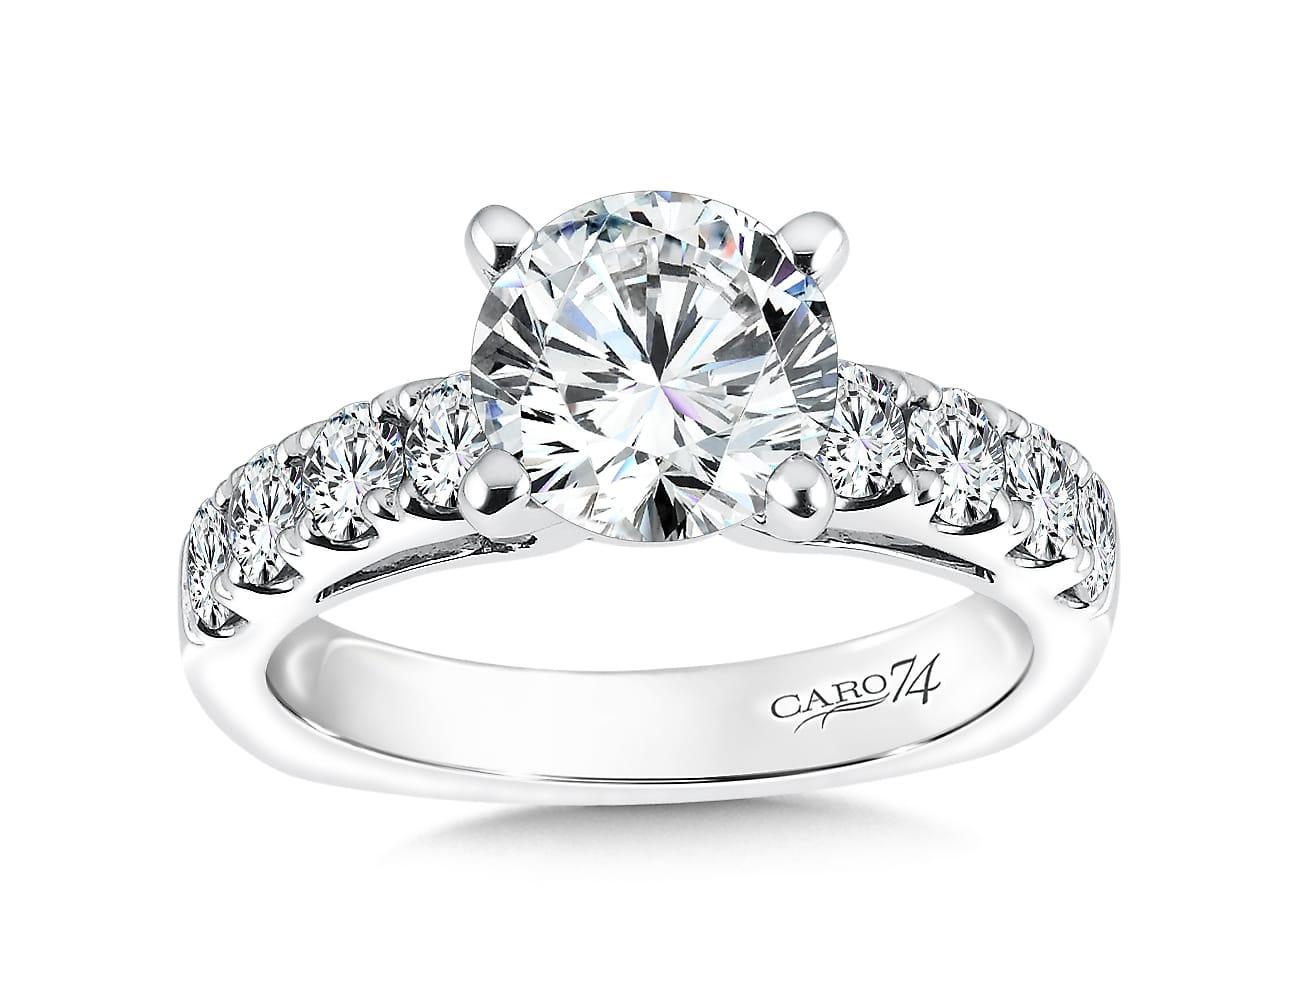 Wholesale Engagement Rings Dallas 5 2, Shira Diamonds